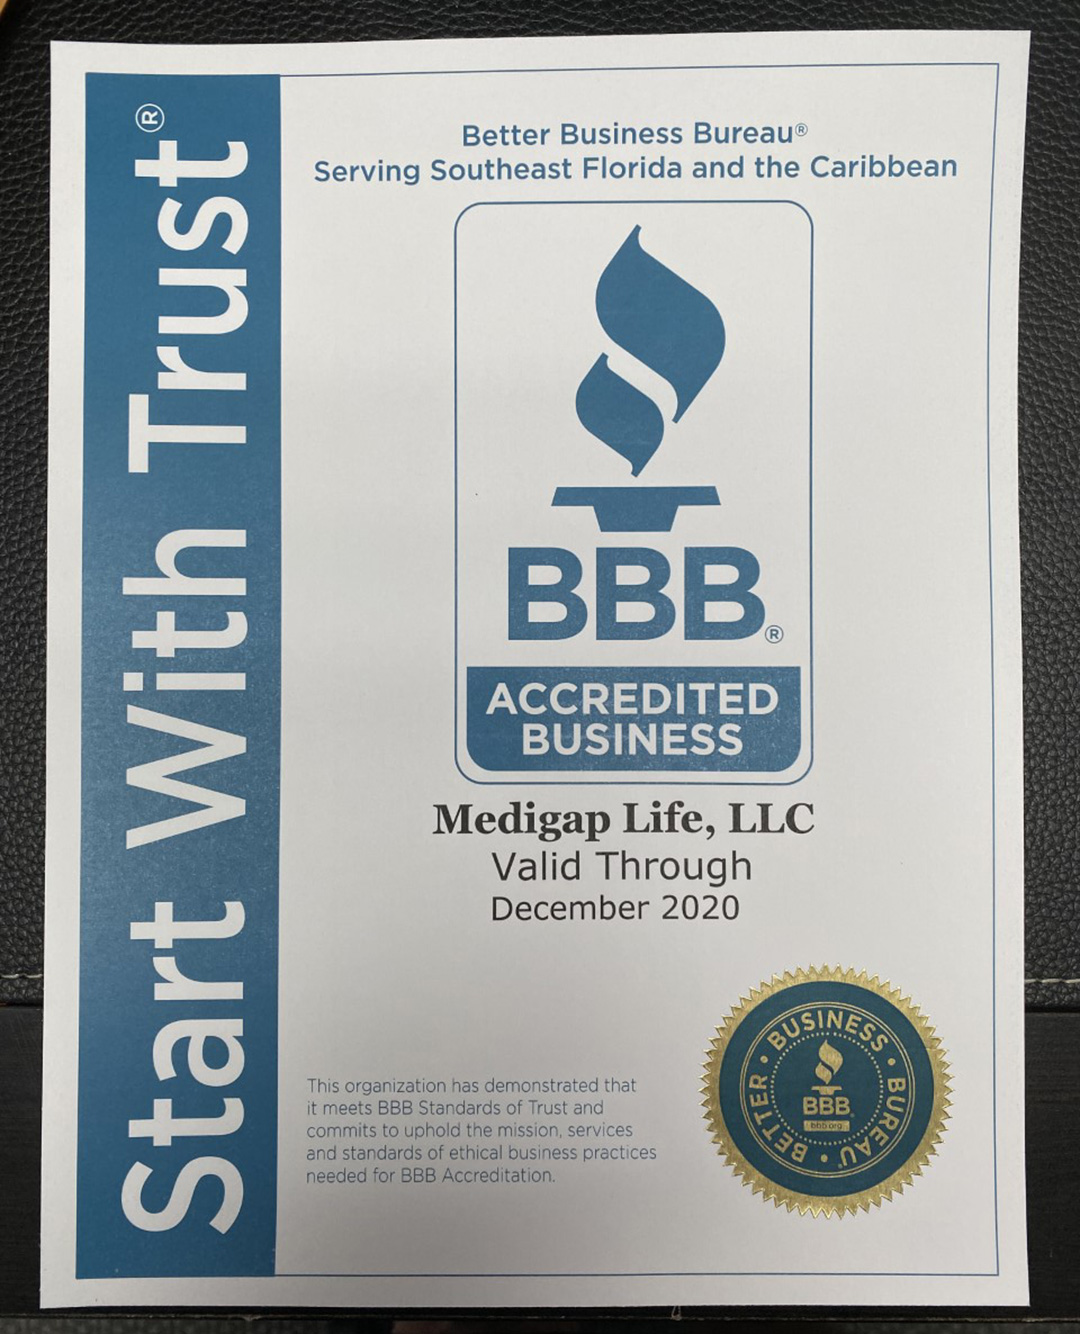 Medigap Life BBB Accreditation